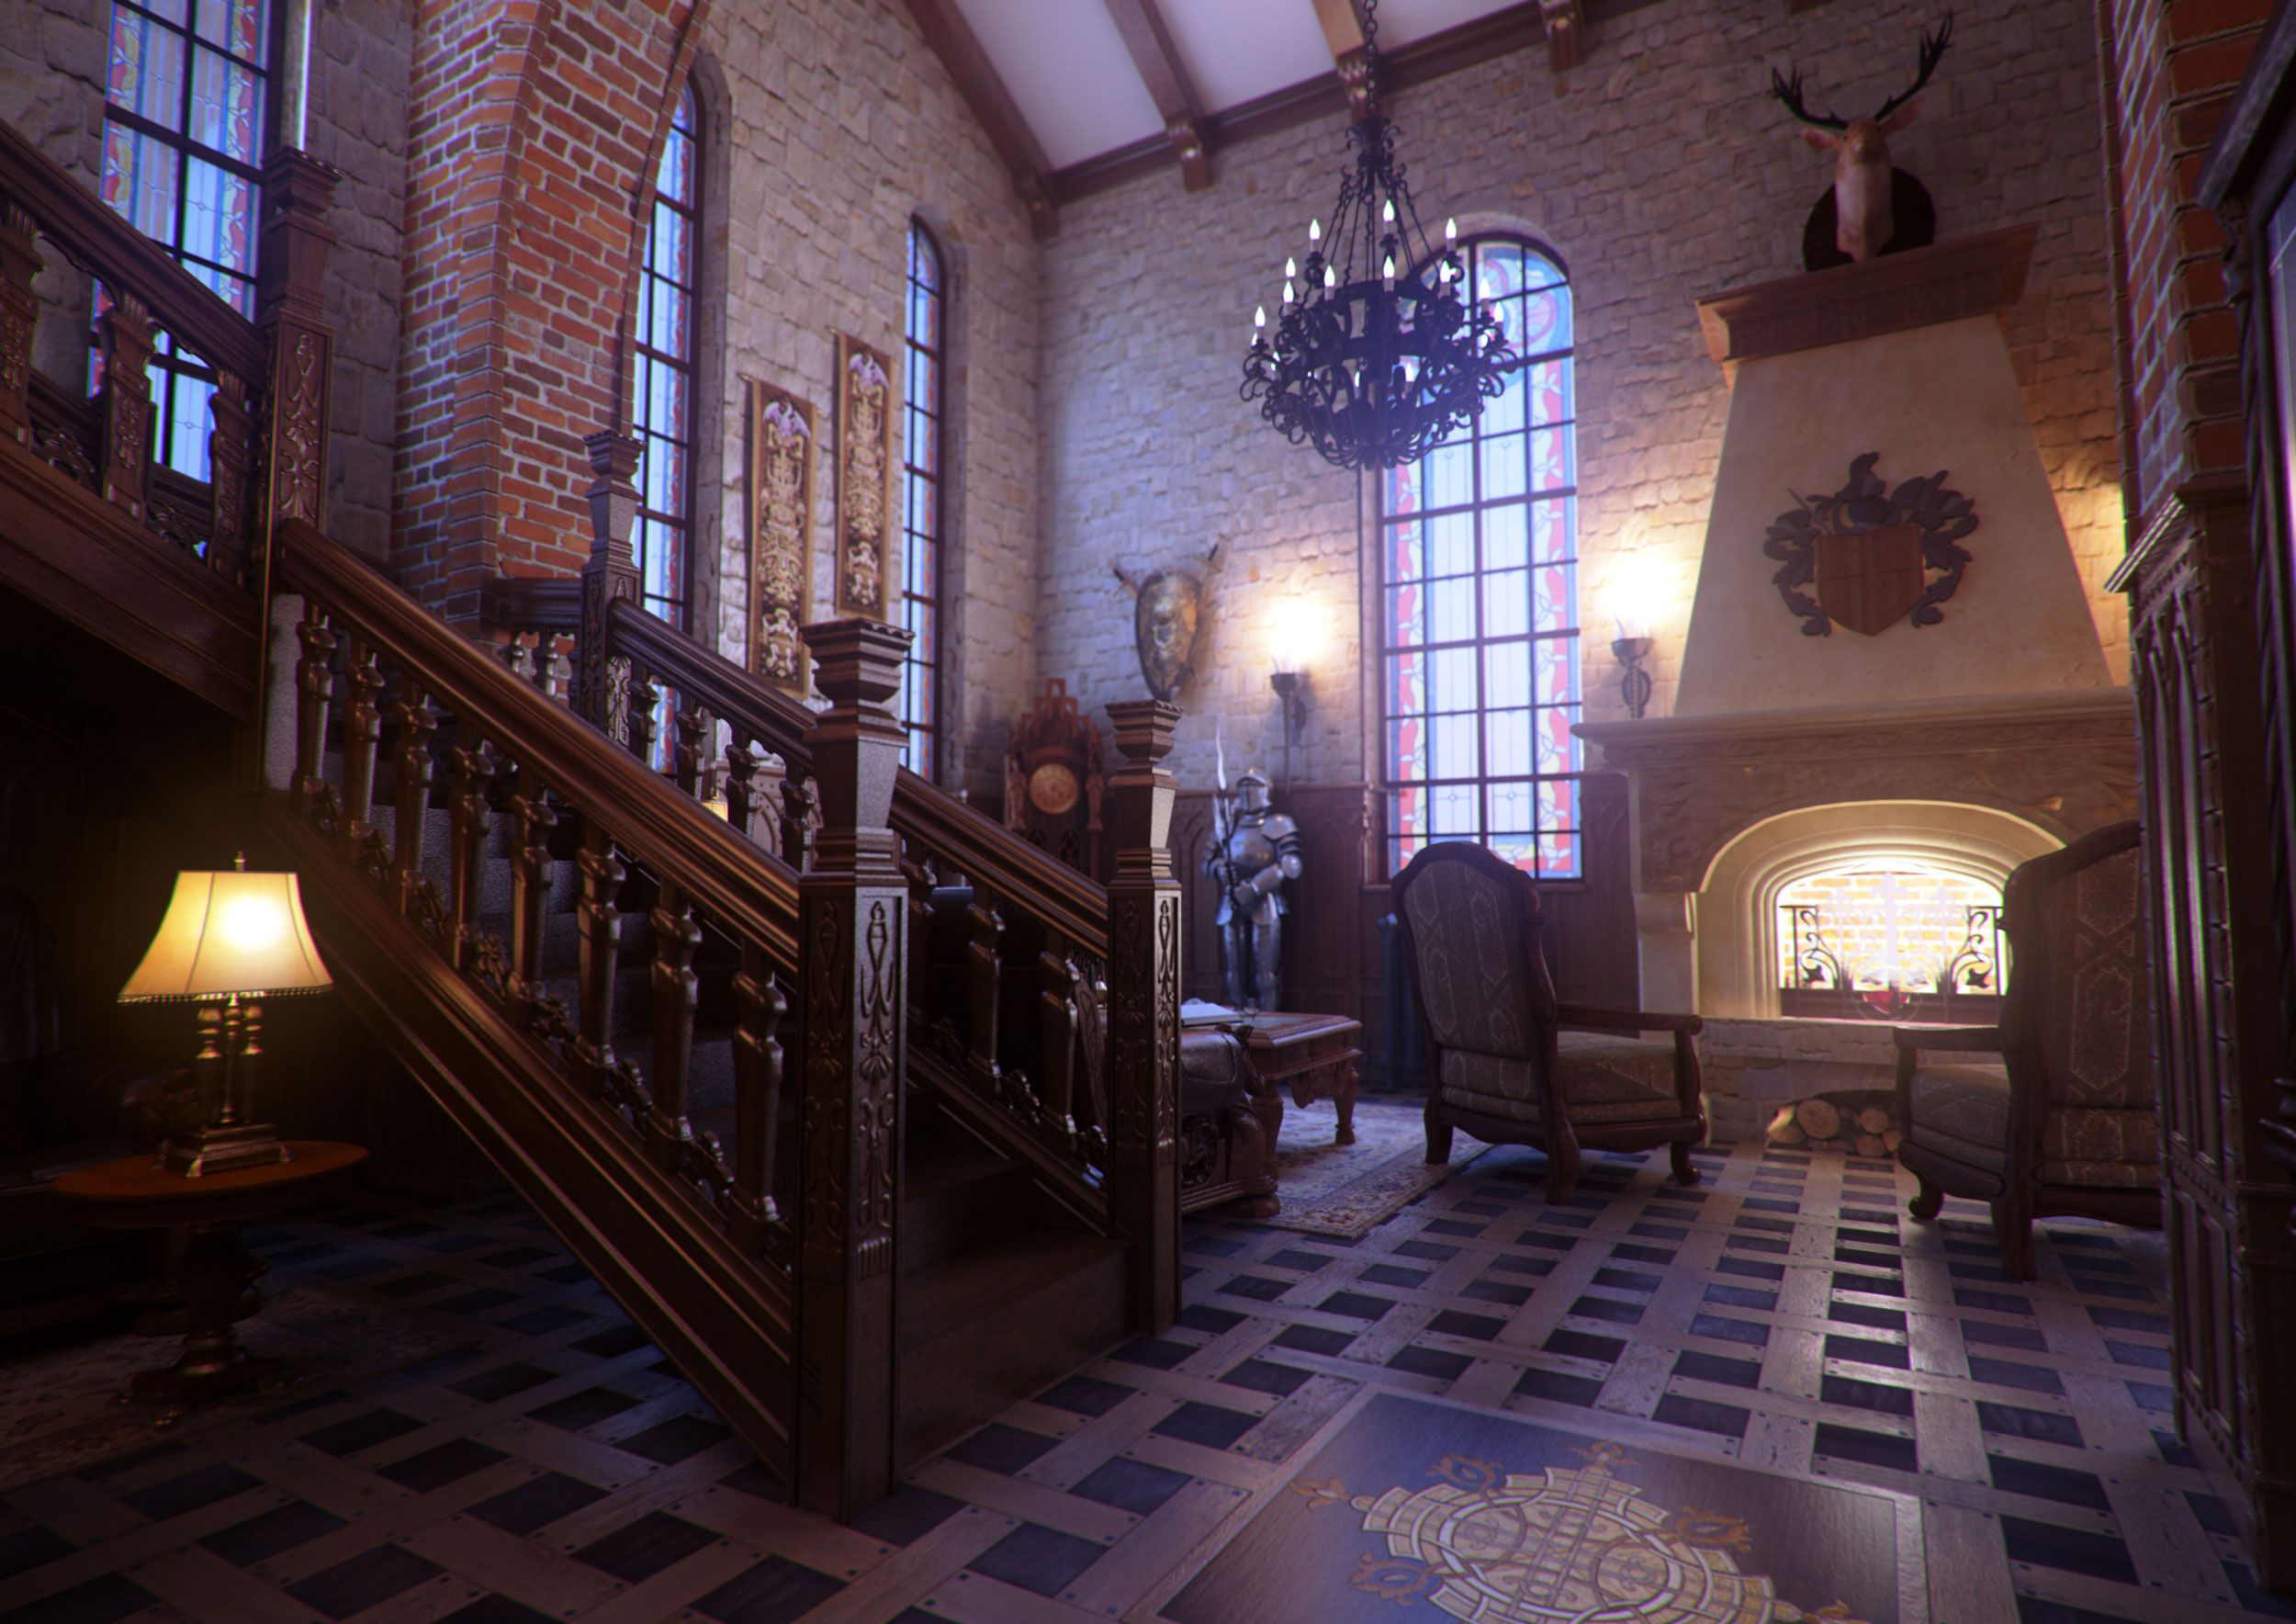 Gothic victorian living room - Amazing Modern Gothic Bedroom Design Ideas With Dark Victorian